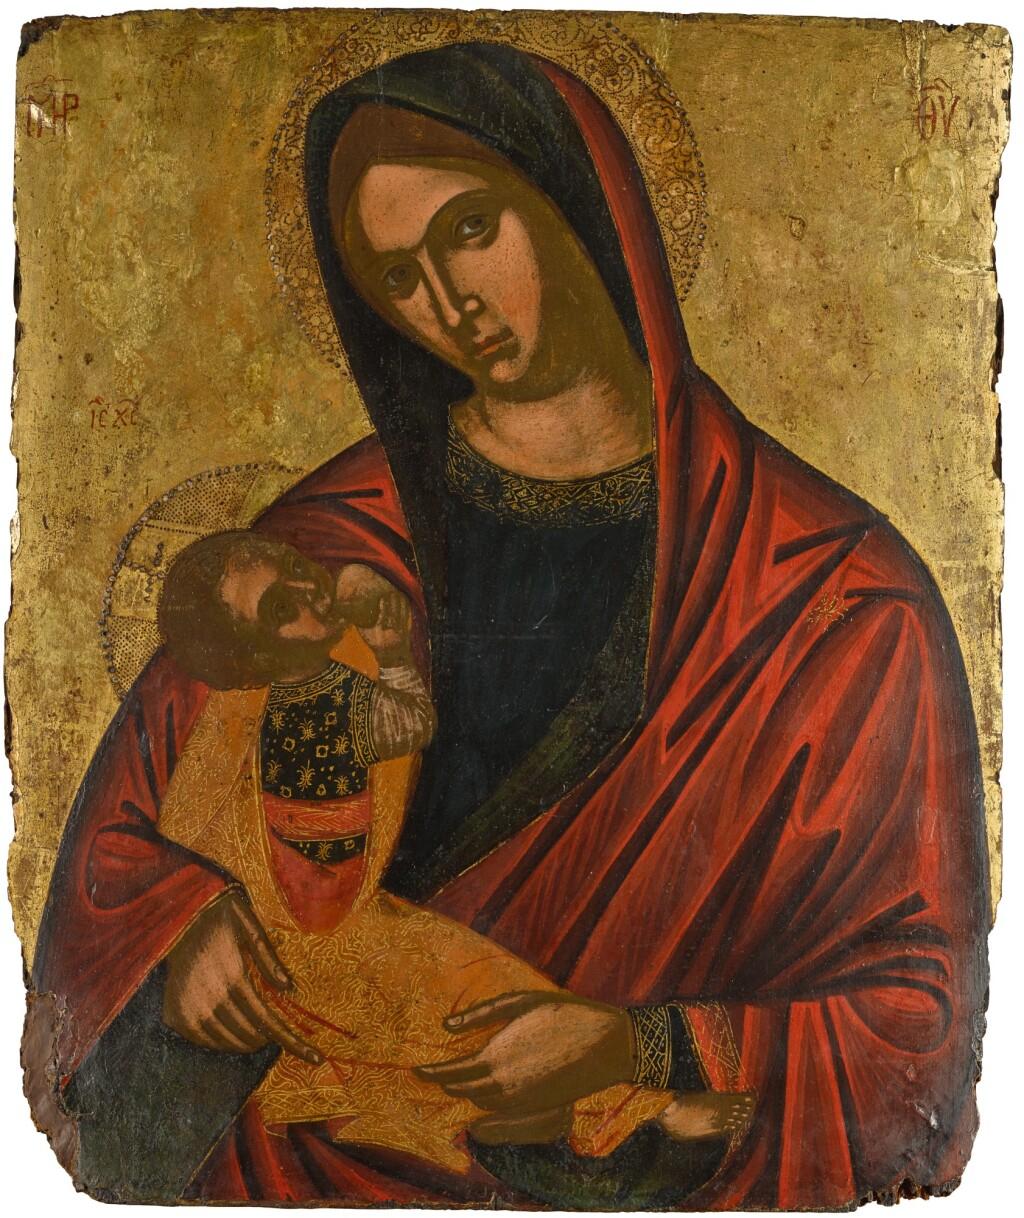 AN ICON OF THE MOTHER OF GOD GALAKTOTROPHOUSA, VENETO-CRETAN, 17TH CENTURY